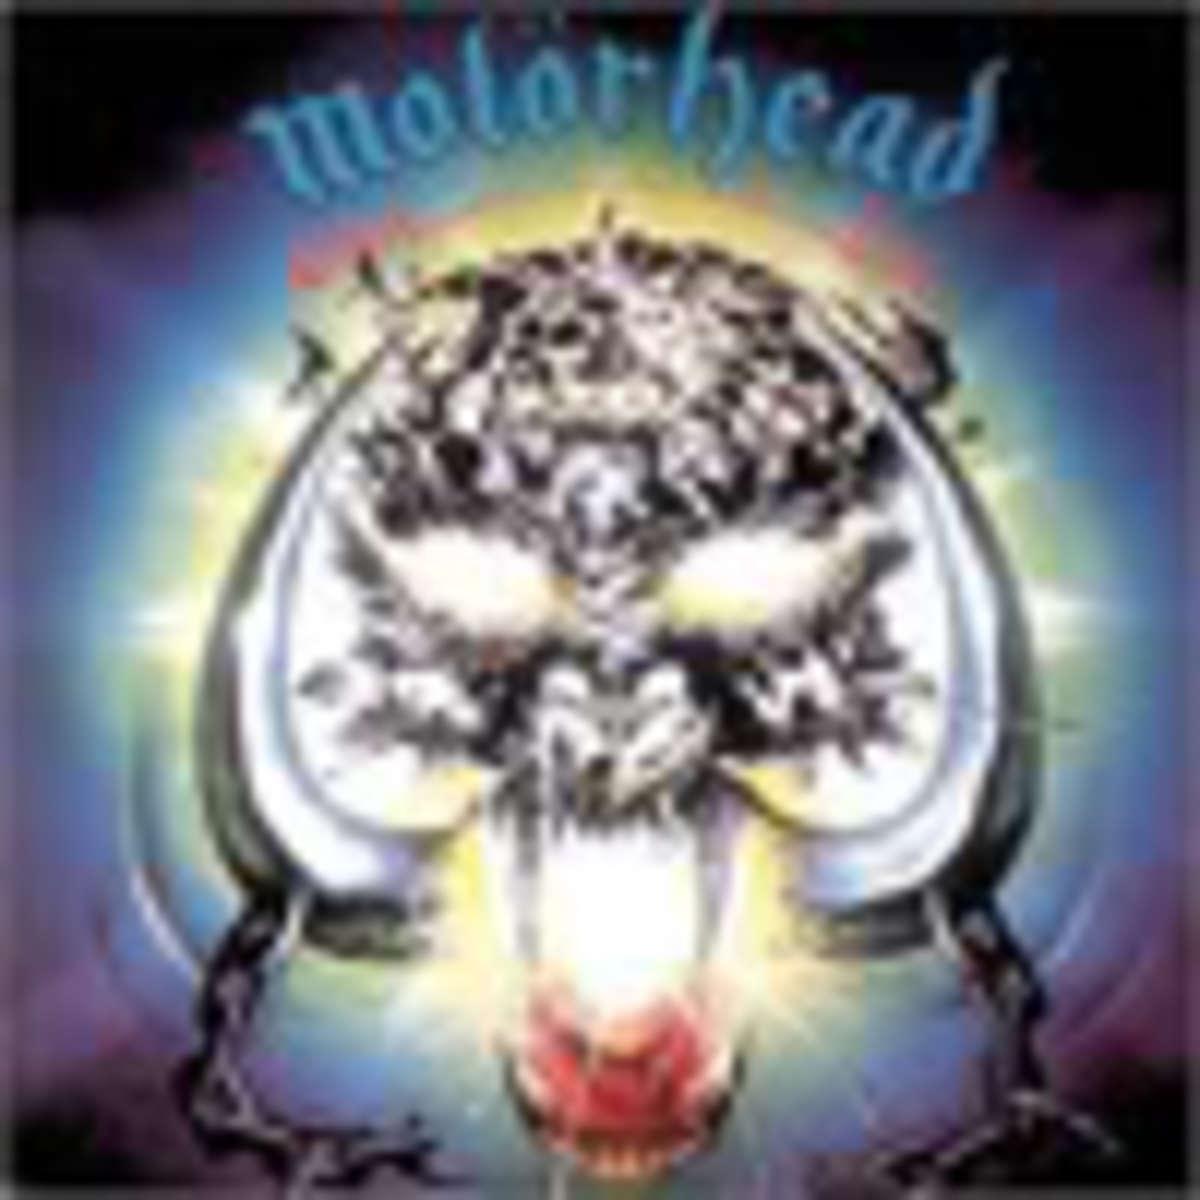 Motorhead Emblem.